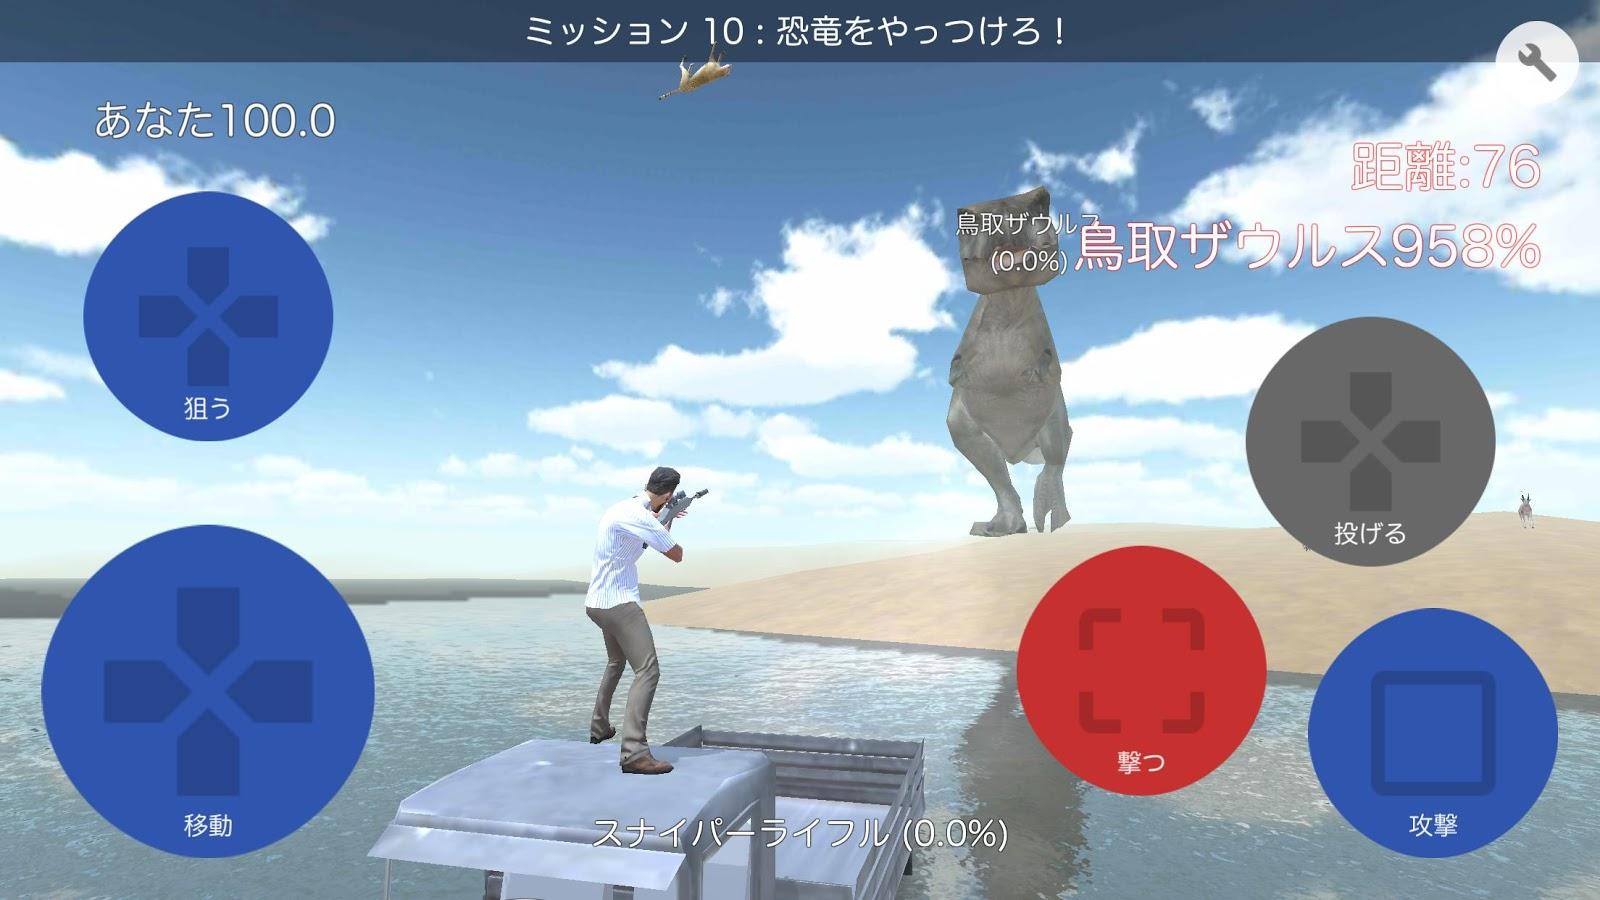 androidアプリ 鳥取砂丘シュミレーター攻略スクリーンショット7